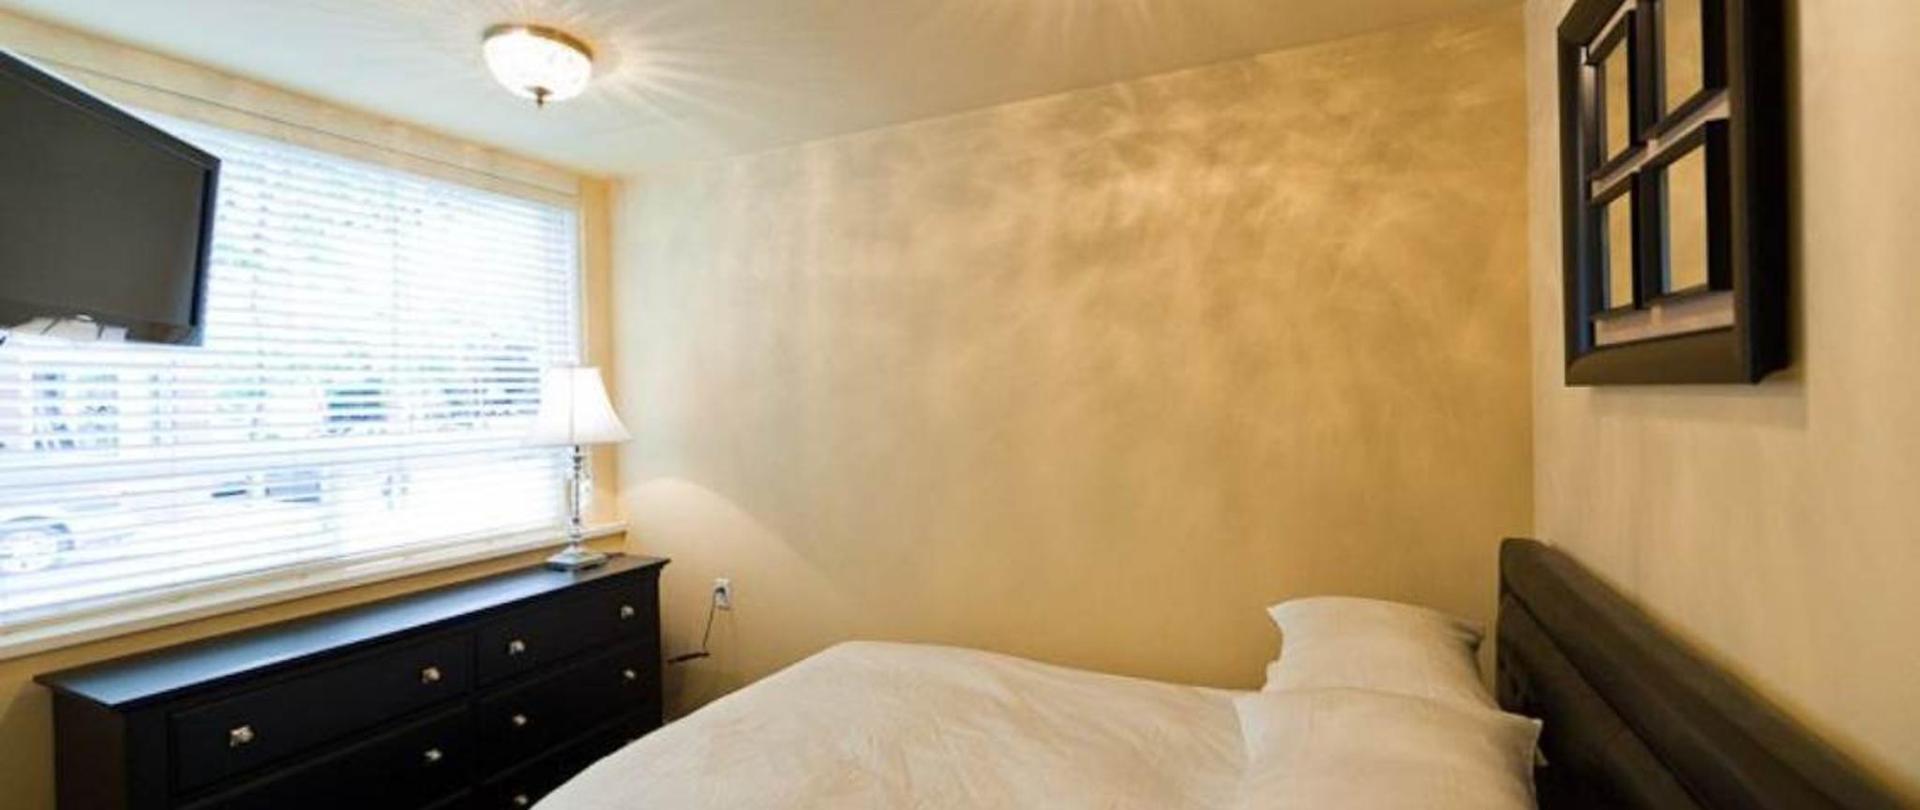 ballard inn official site | hotels in seattle